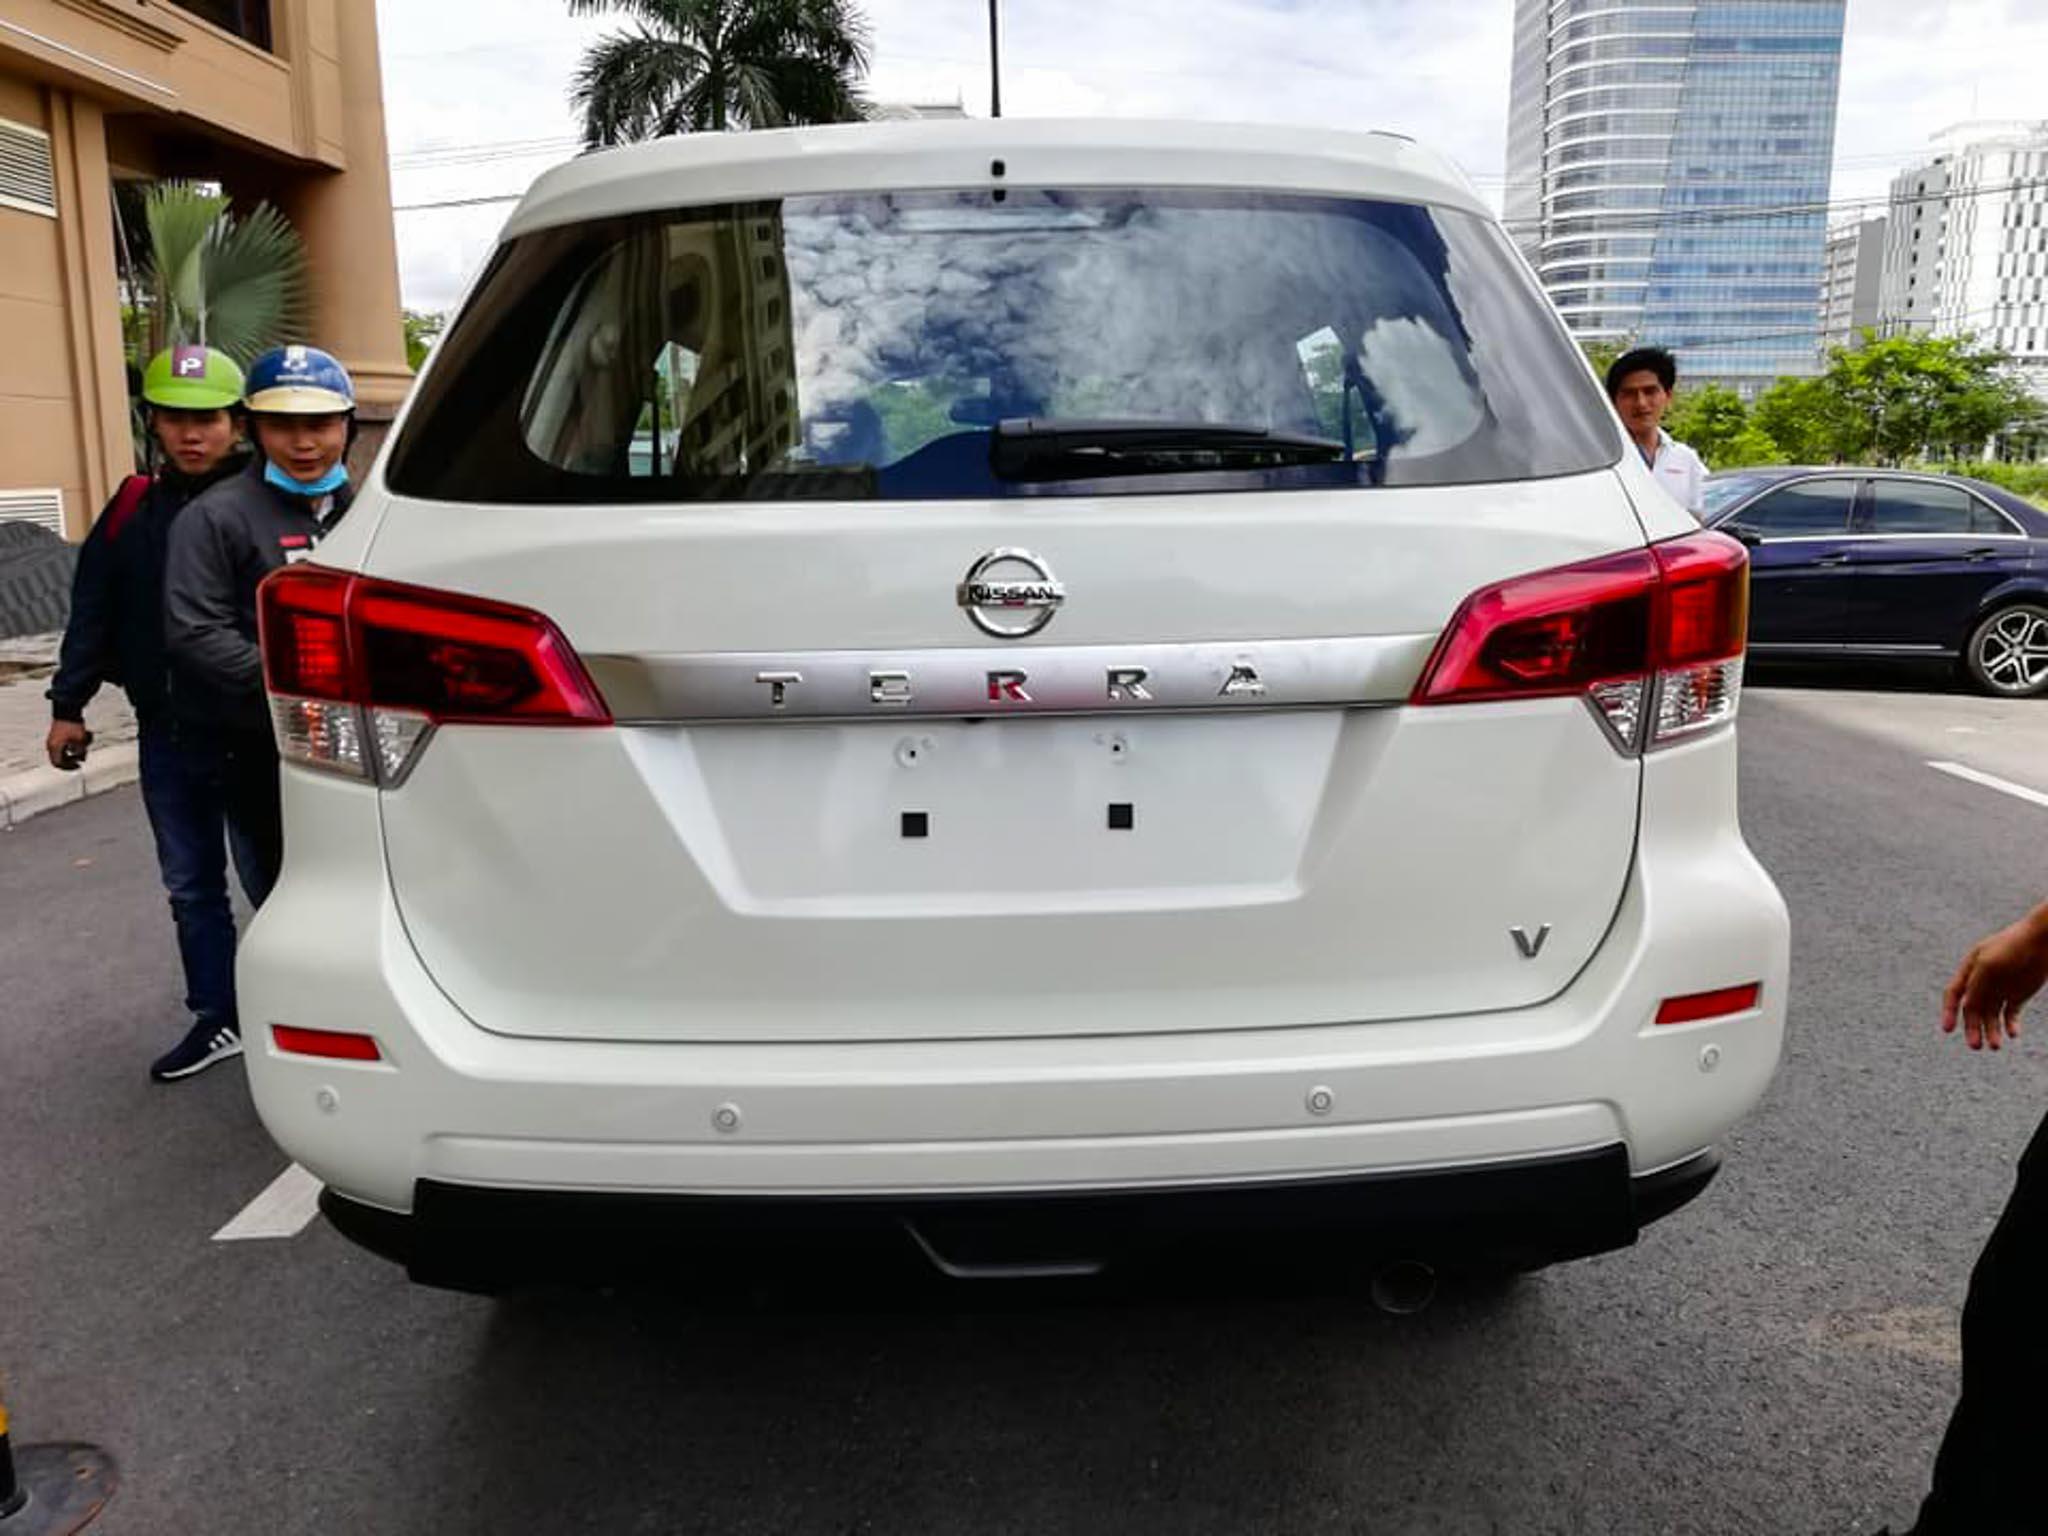 Nissan-Terra-2019-xuat-hien-tren-pho-Sai-gon